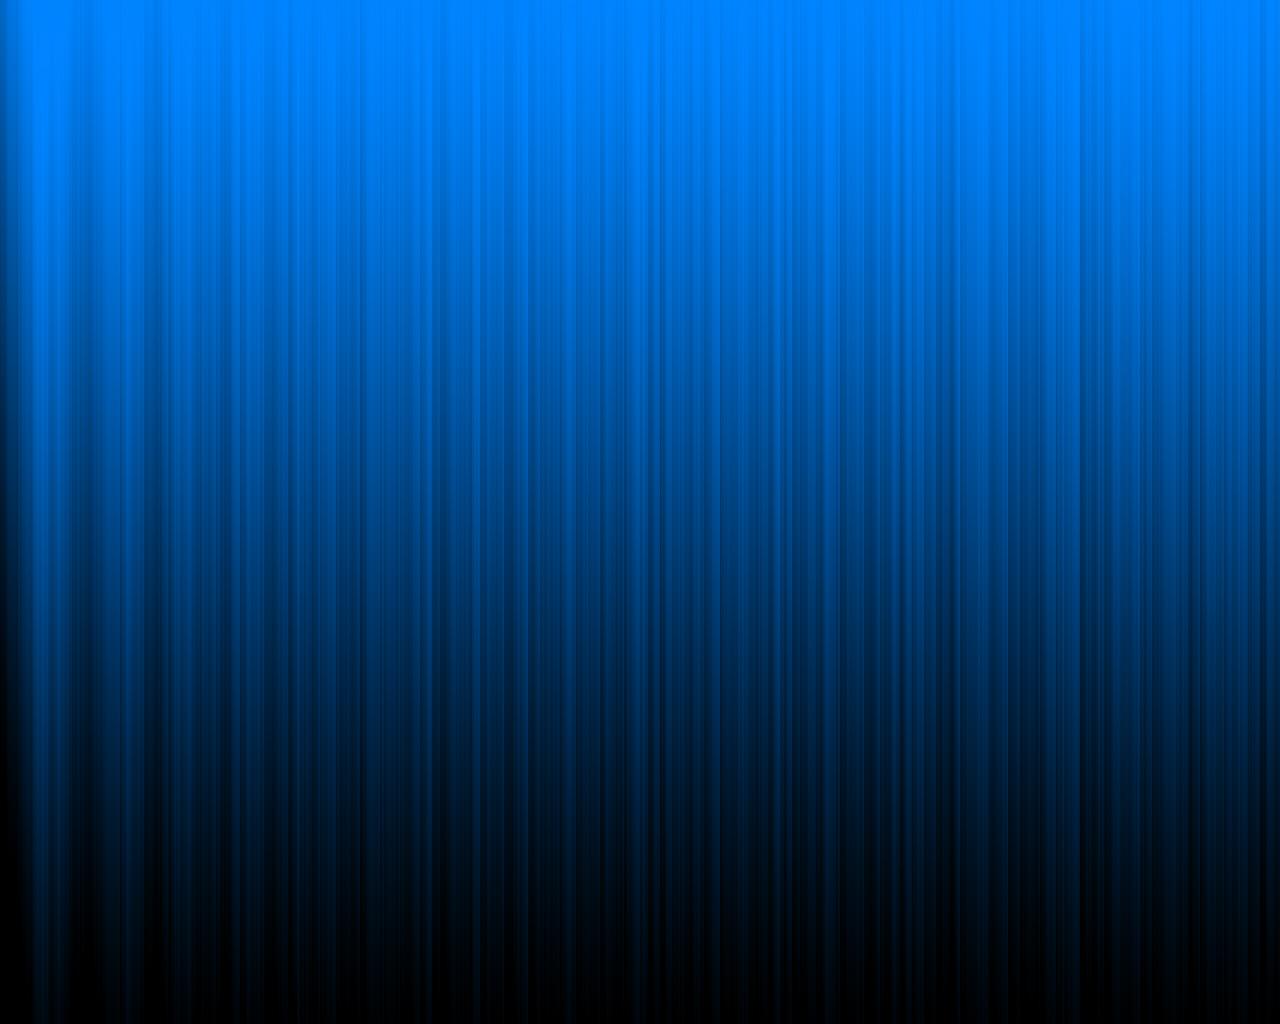 http://3.bp.blogspot.com/-vmh1i-b3XNY/T9iTjPGKYZI/AAAAAAAAFwo/jv3Yysxcl9Q/s1600/Blue-wallpaper-23.jpg#Blue%201280x1024